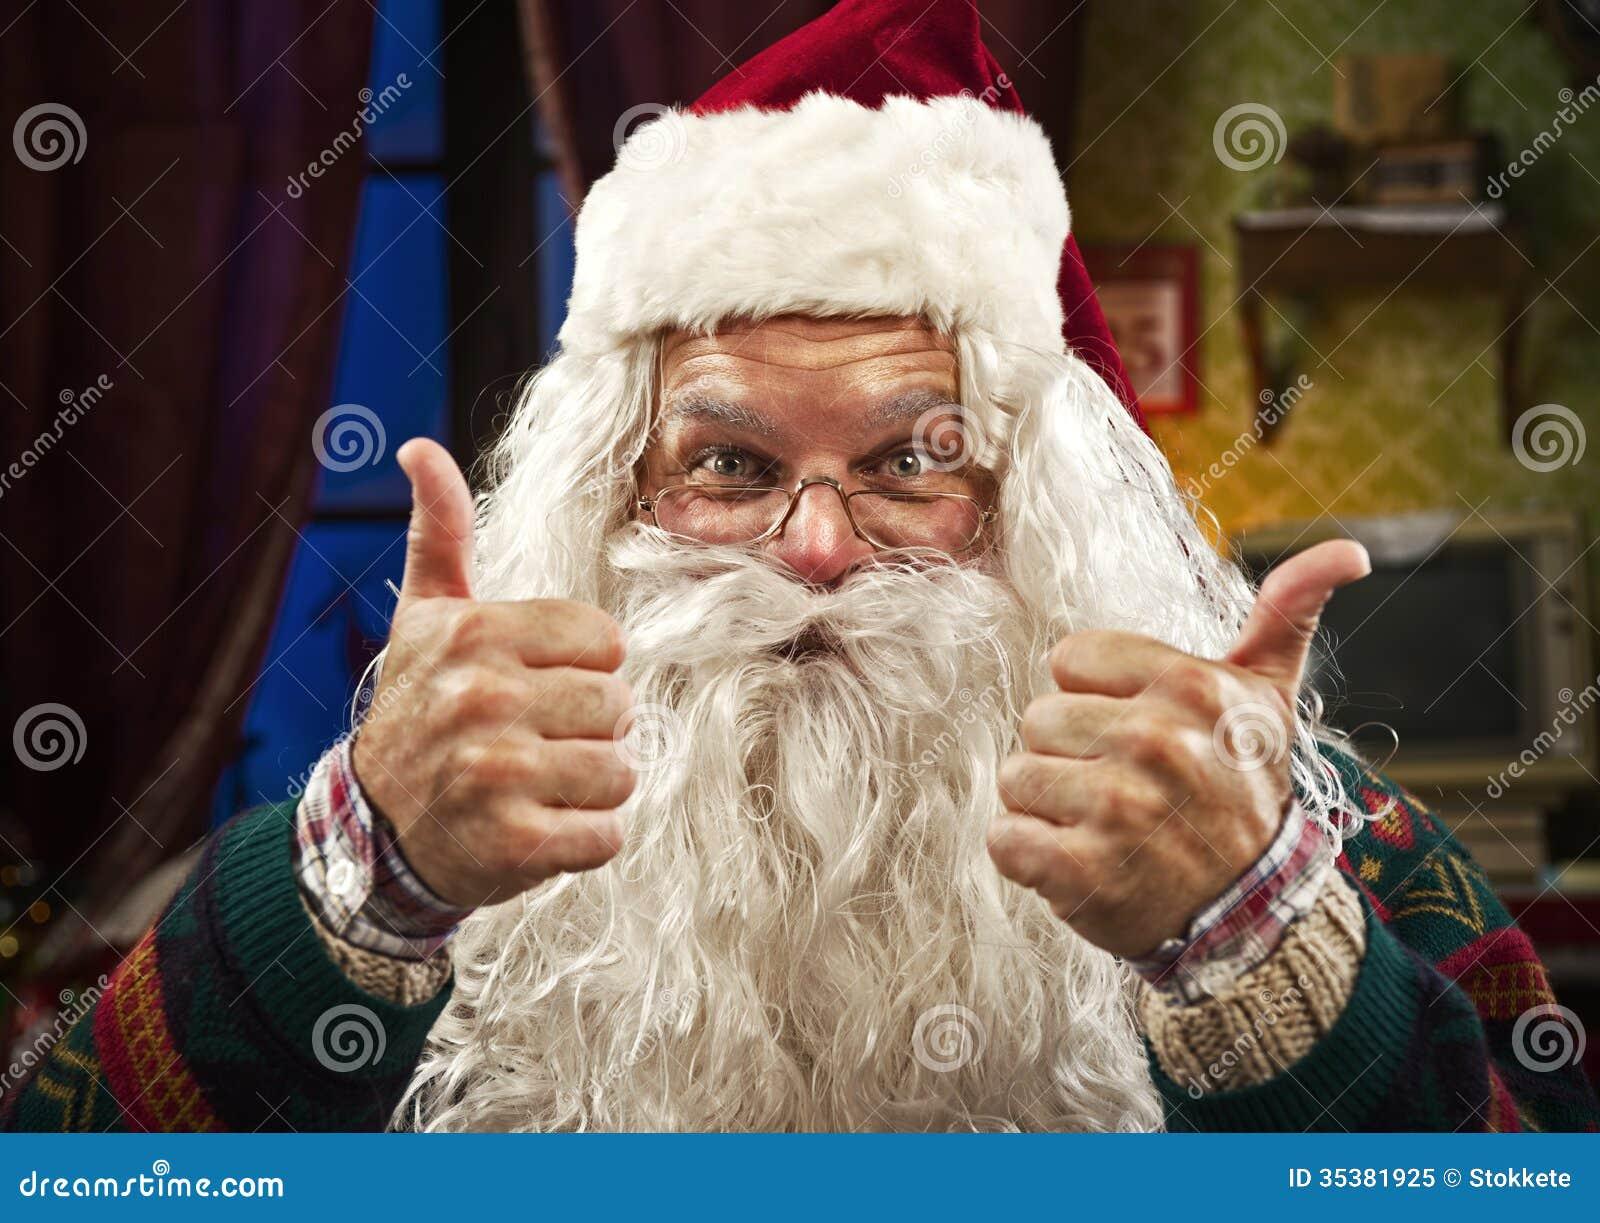 Beach Christmas Cards >> Santa Claus Royalty Free Stock Photo - Image: 35381925